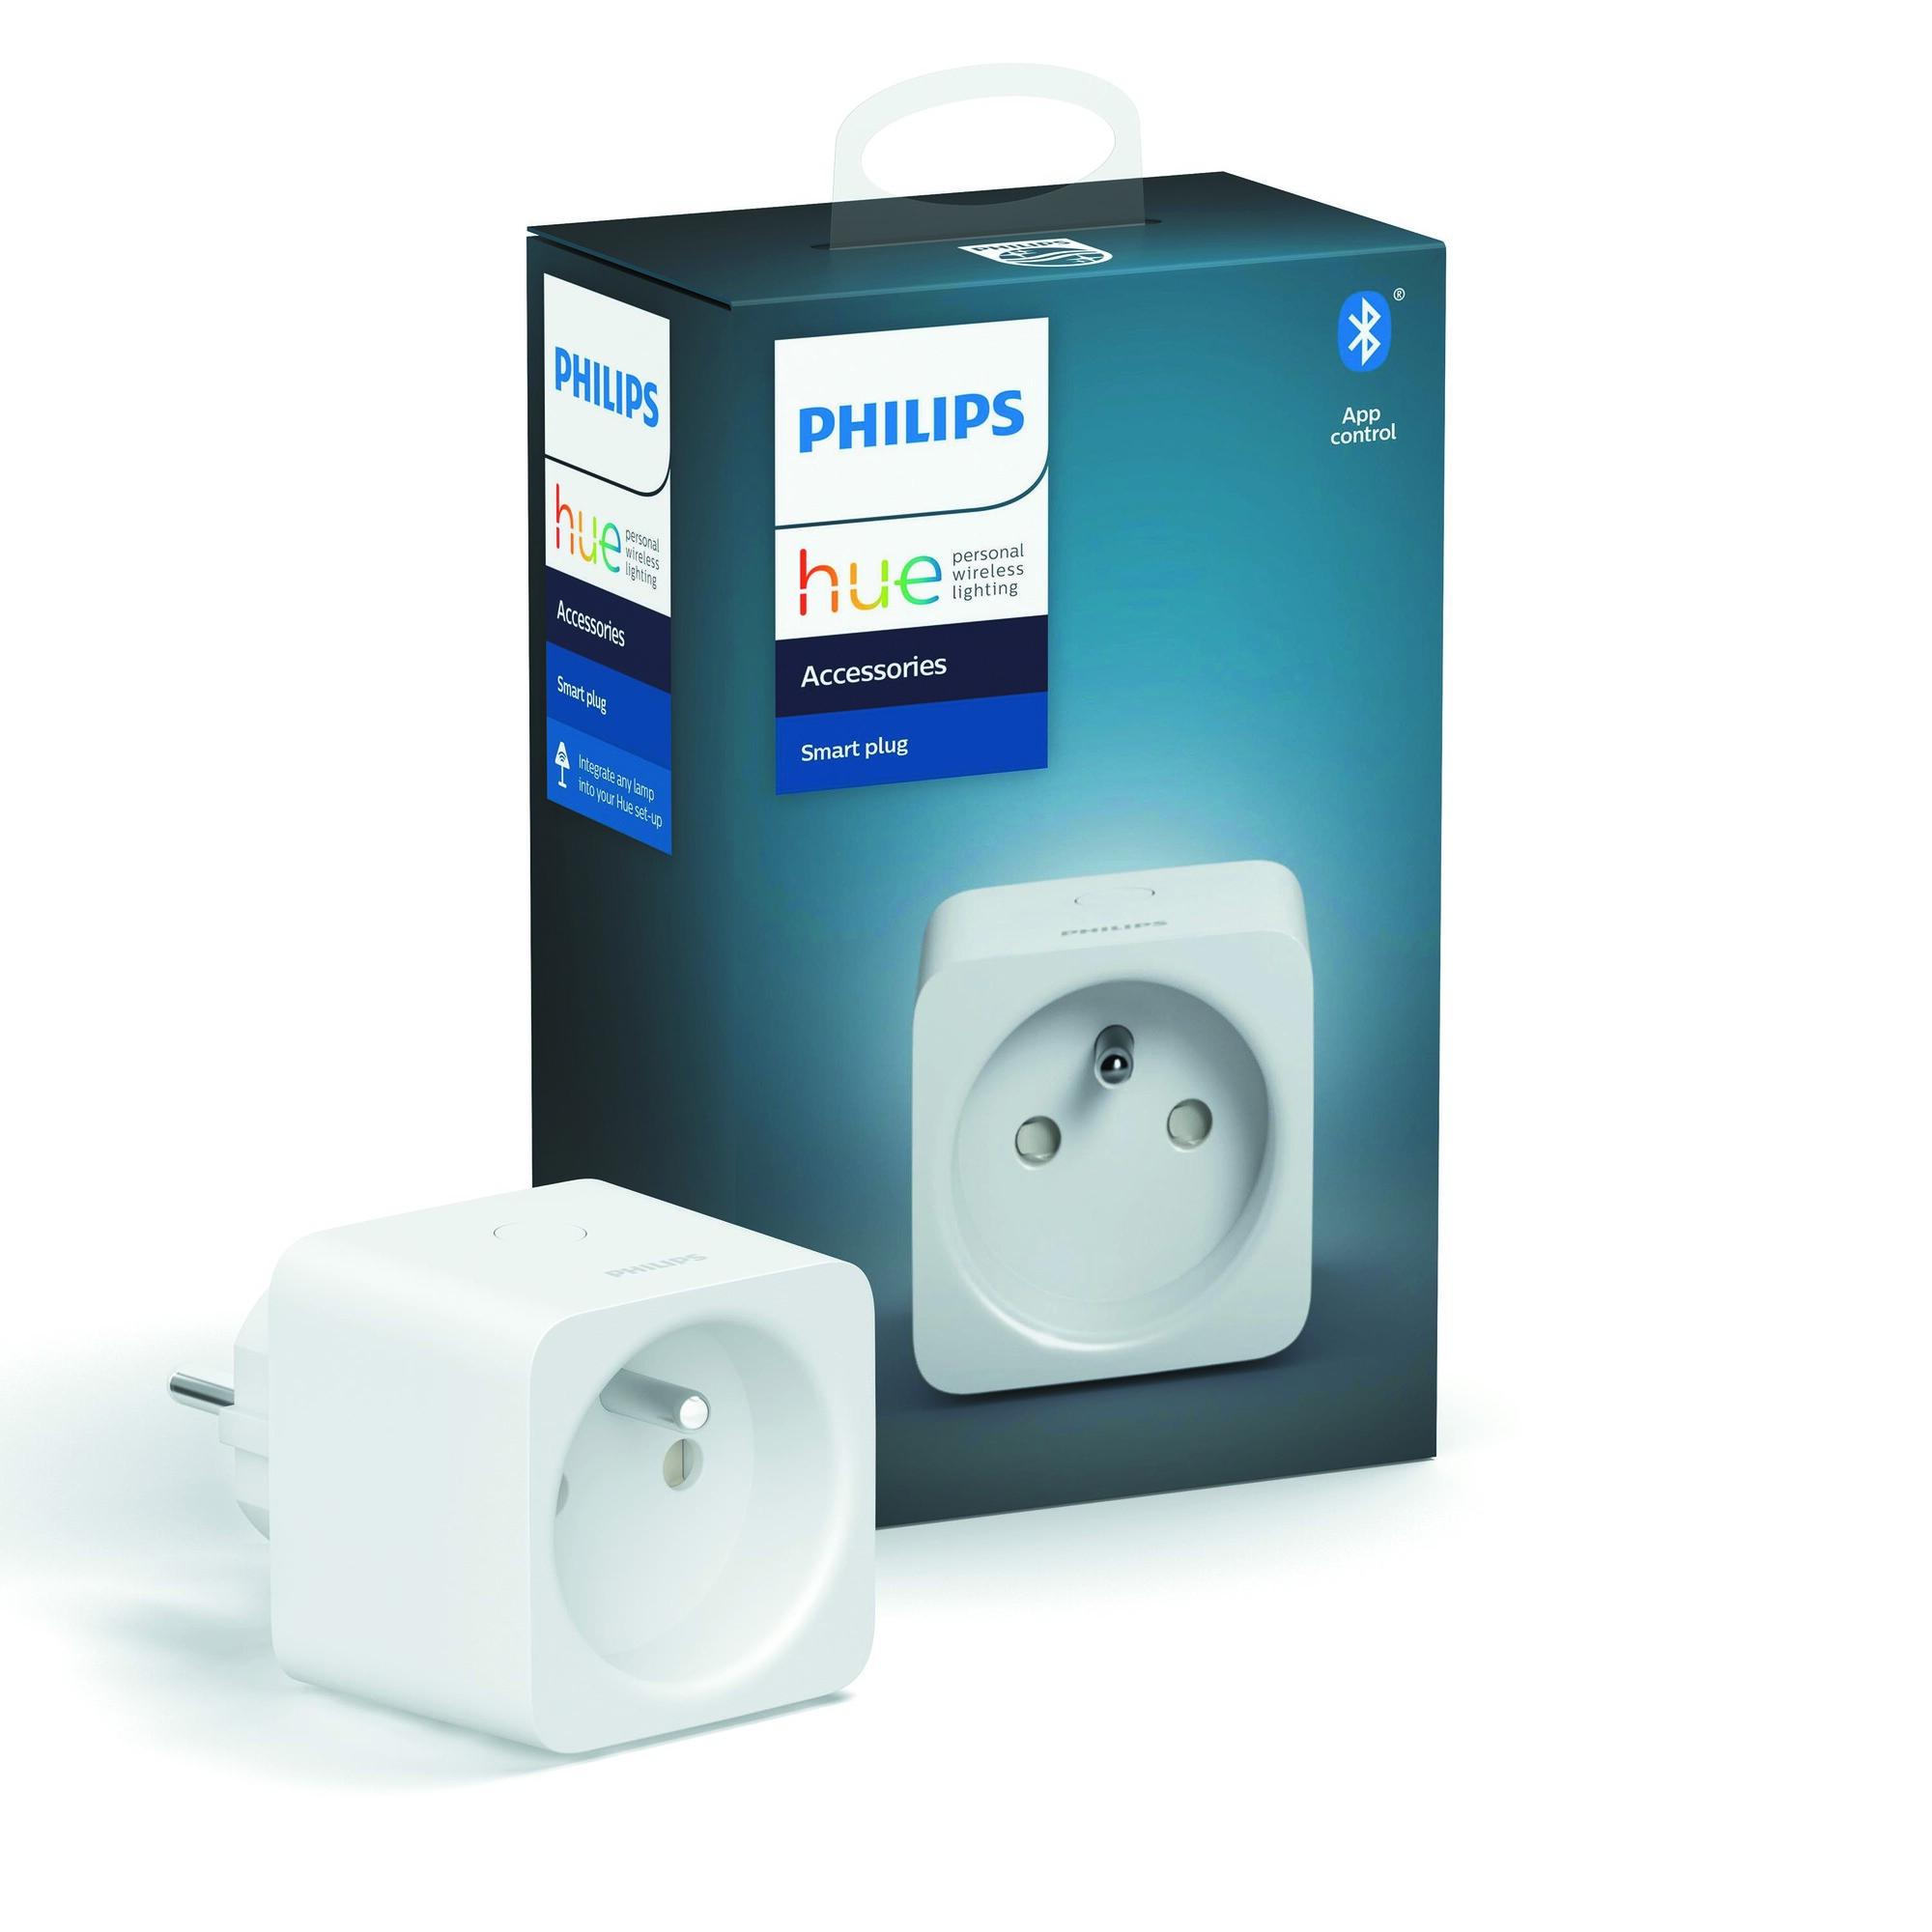 Philips HUE Smart plug BE/FR Blanc